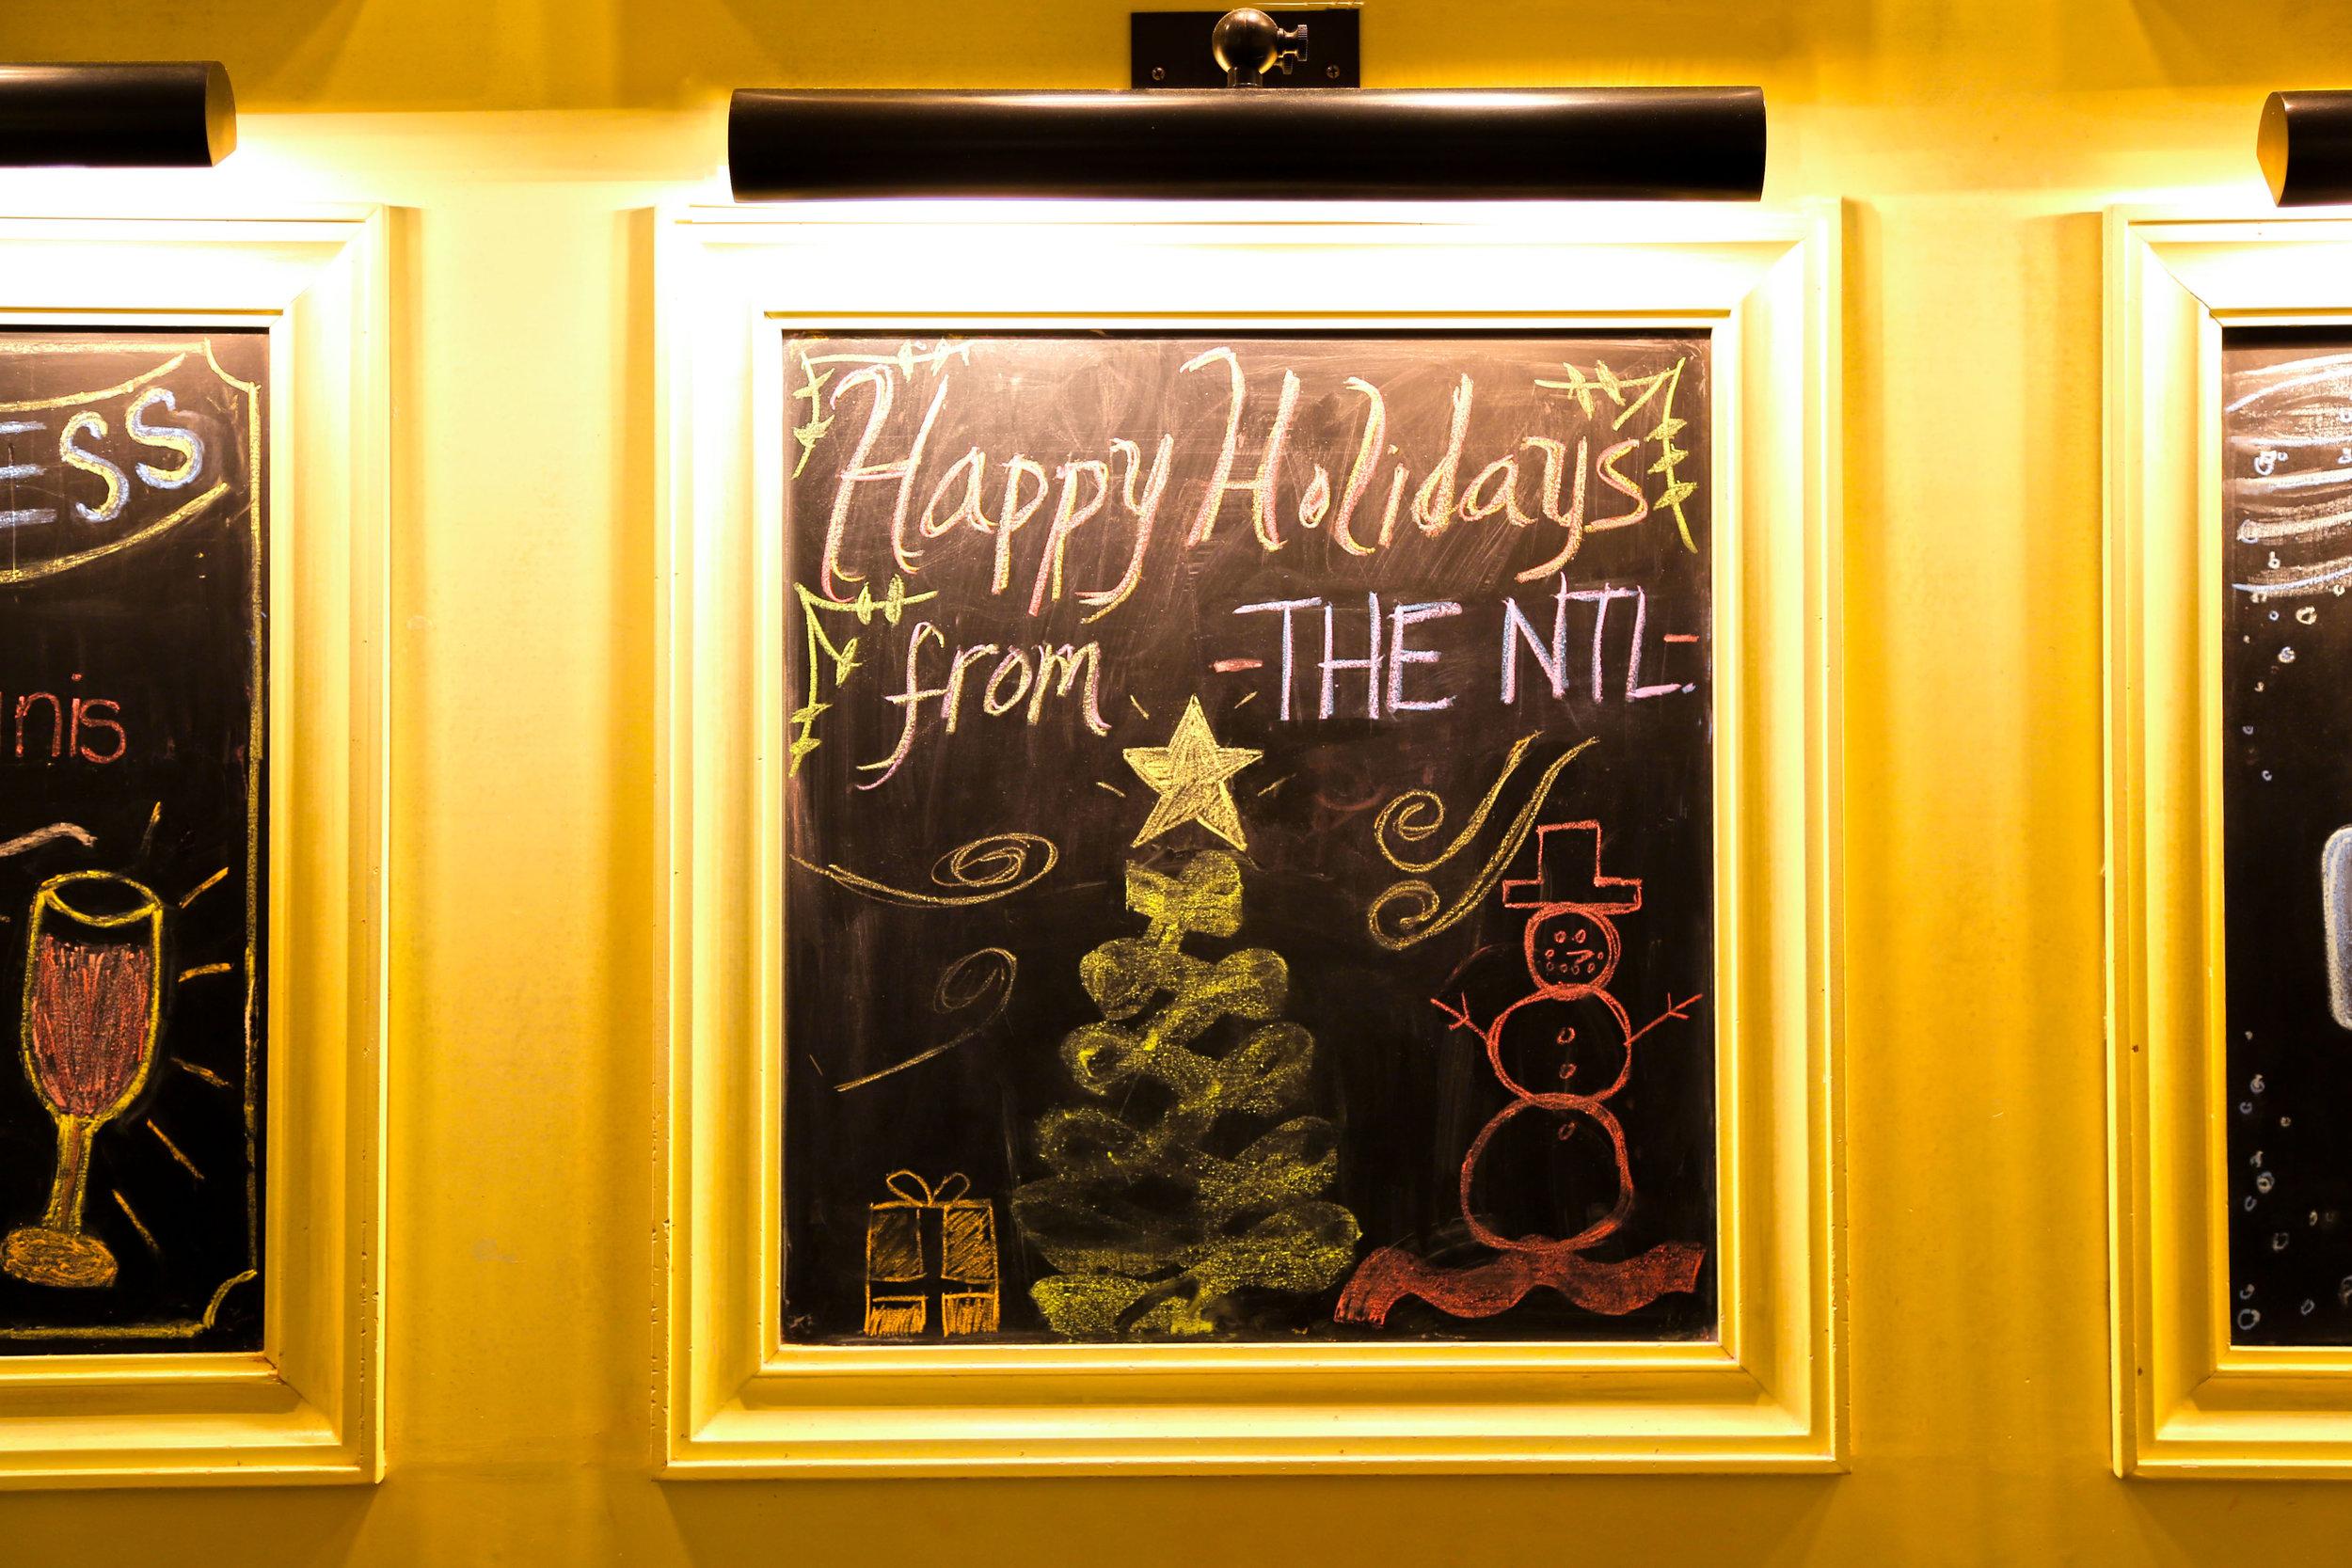 Happy-Holidays-The National-1-s.jpg